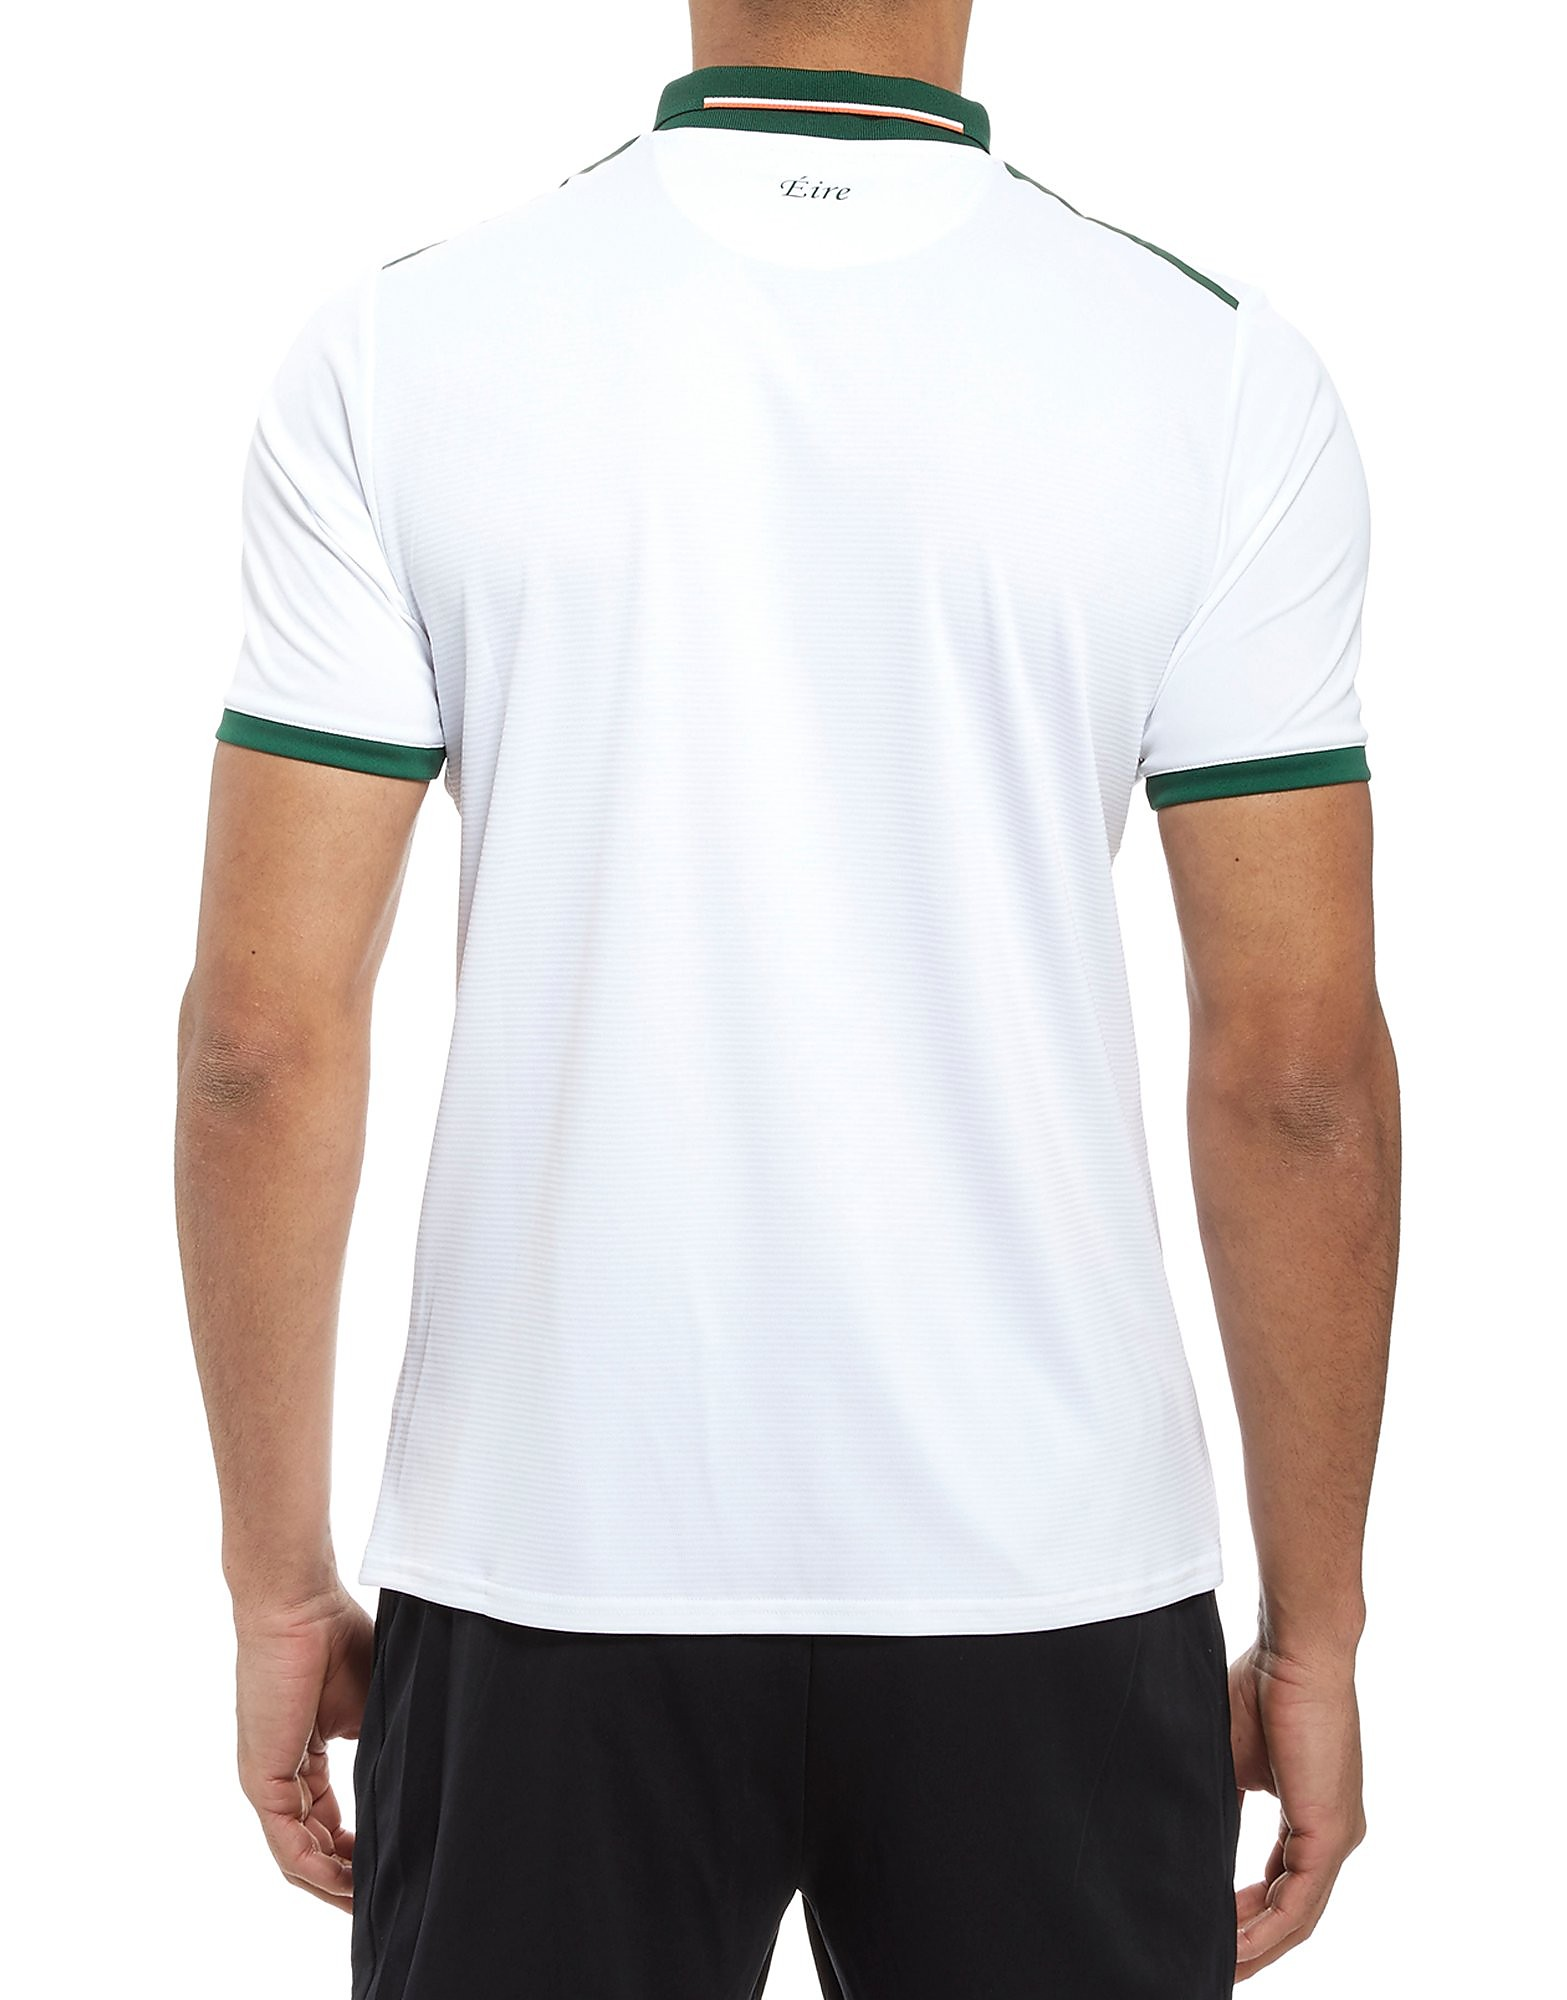 New Balance camiseta 2.ª equipación República de Irlanda